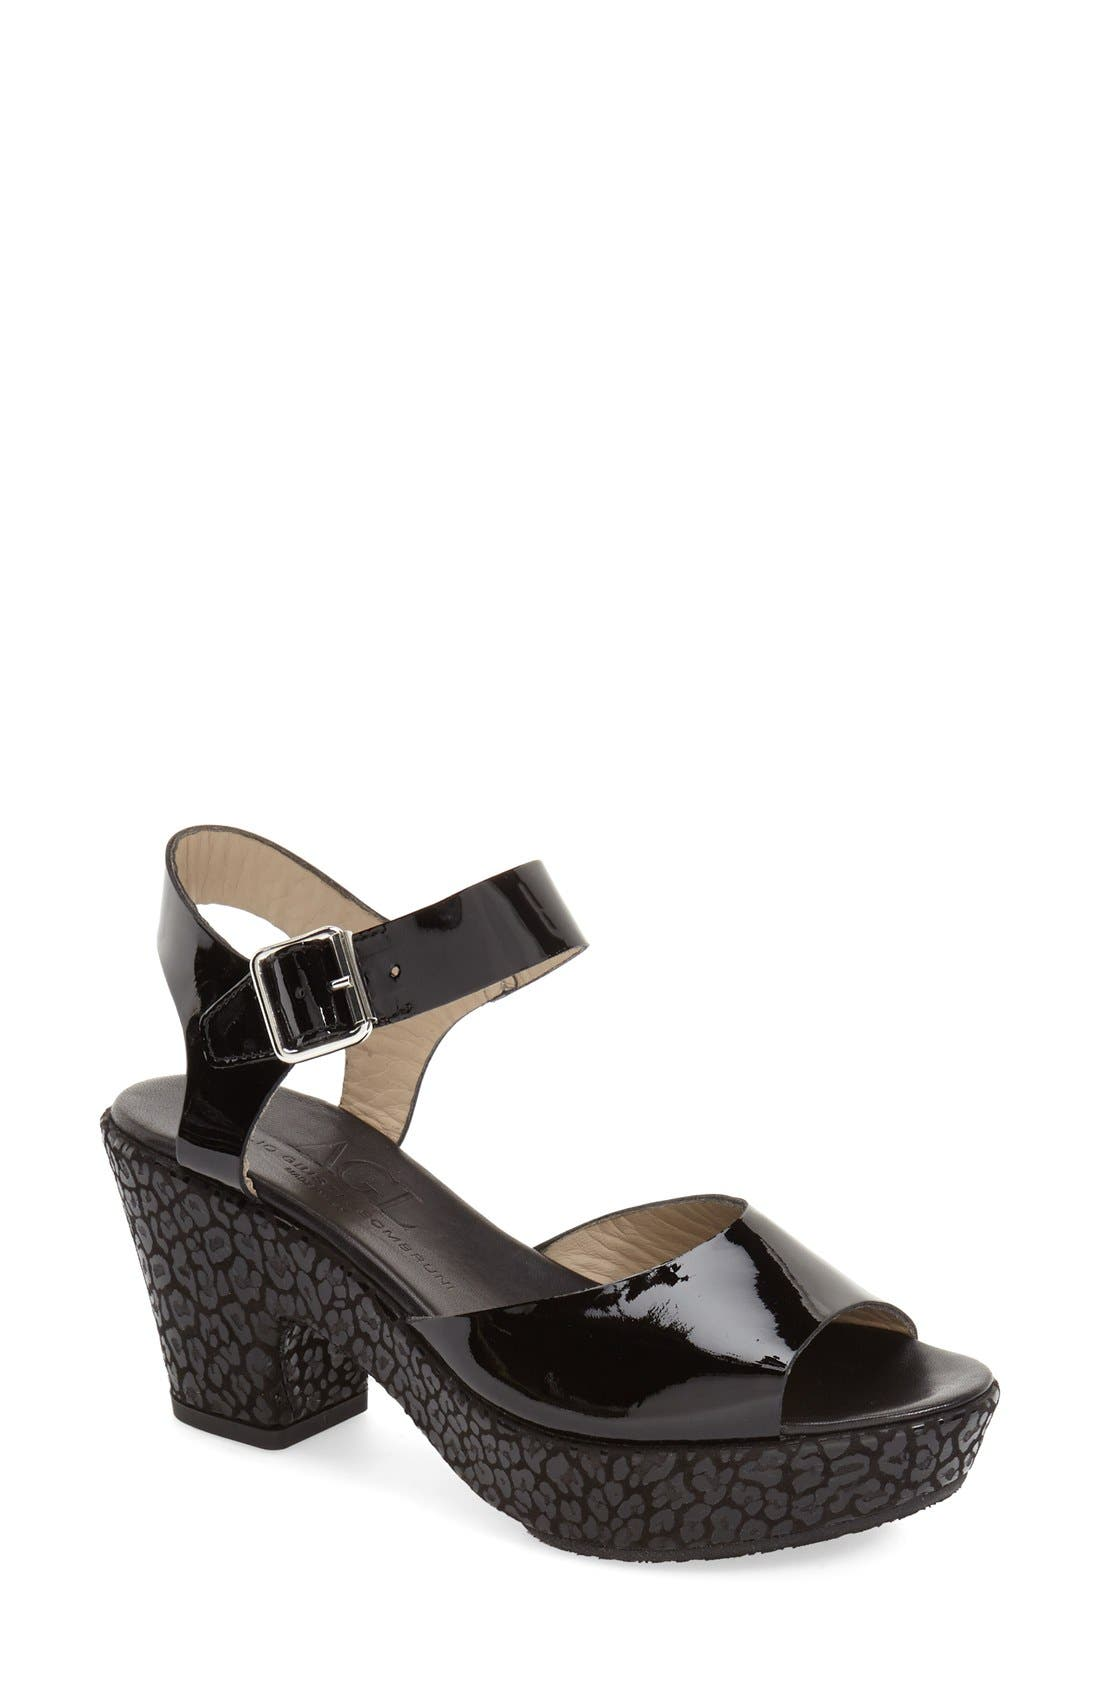 AGL 'Sylvia' Platform Wedge Sandal, Main, color, 001